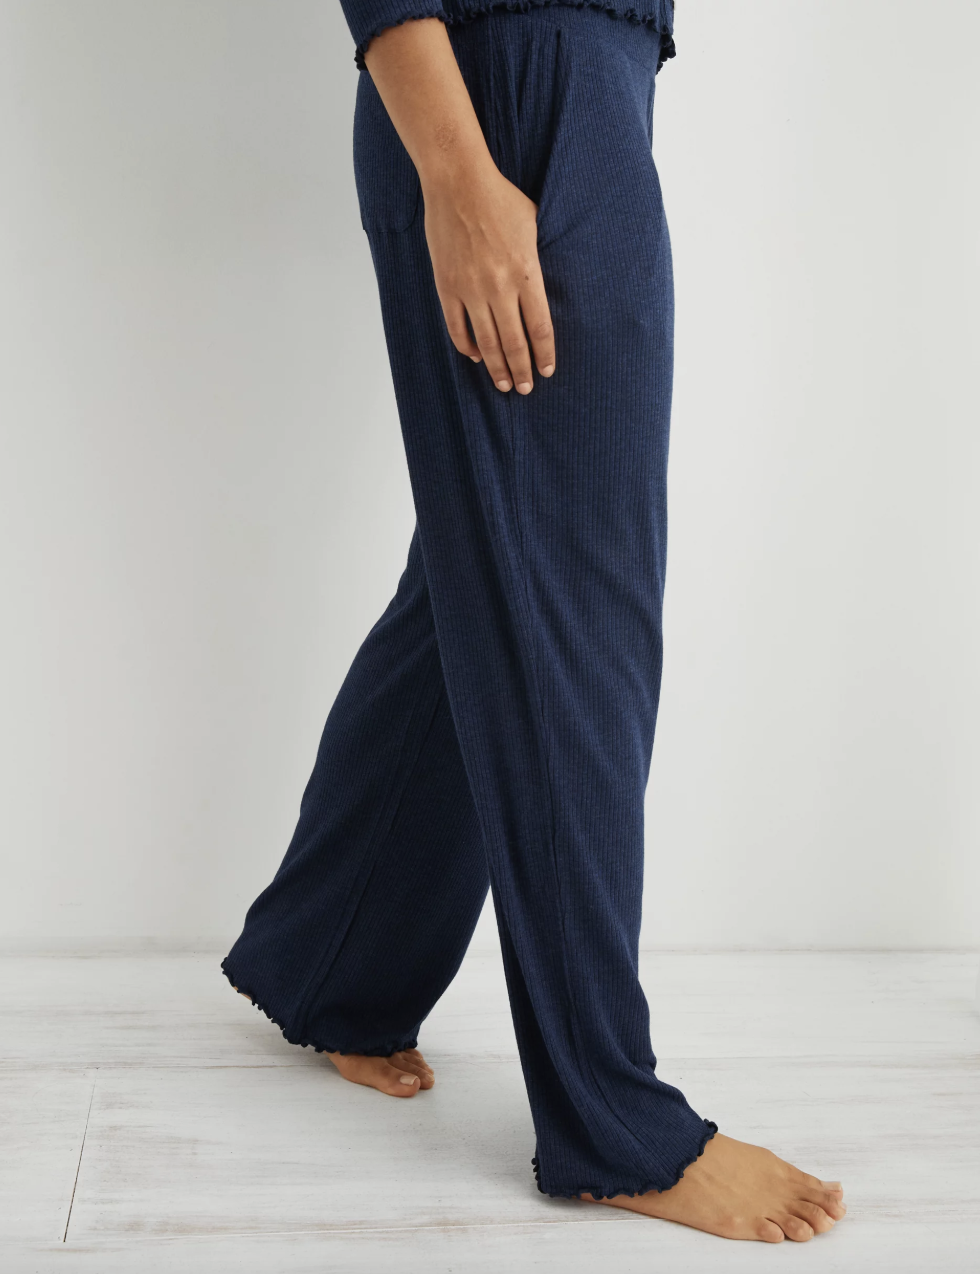 model wearing the wide leg navy sleep pants